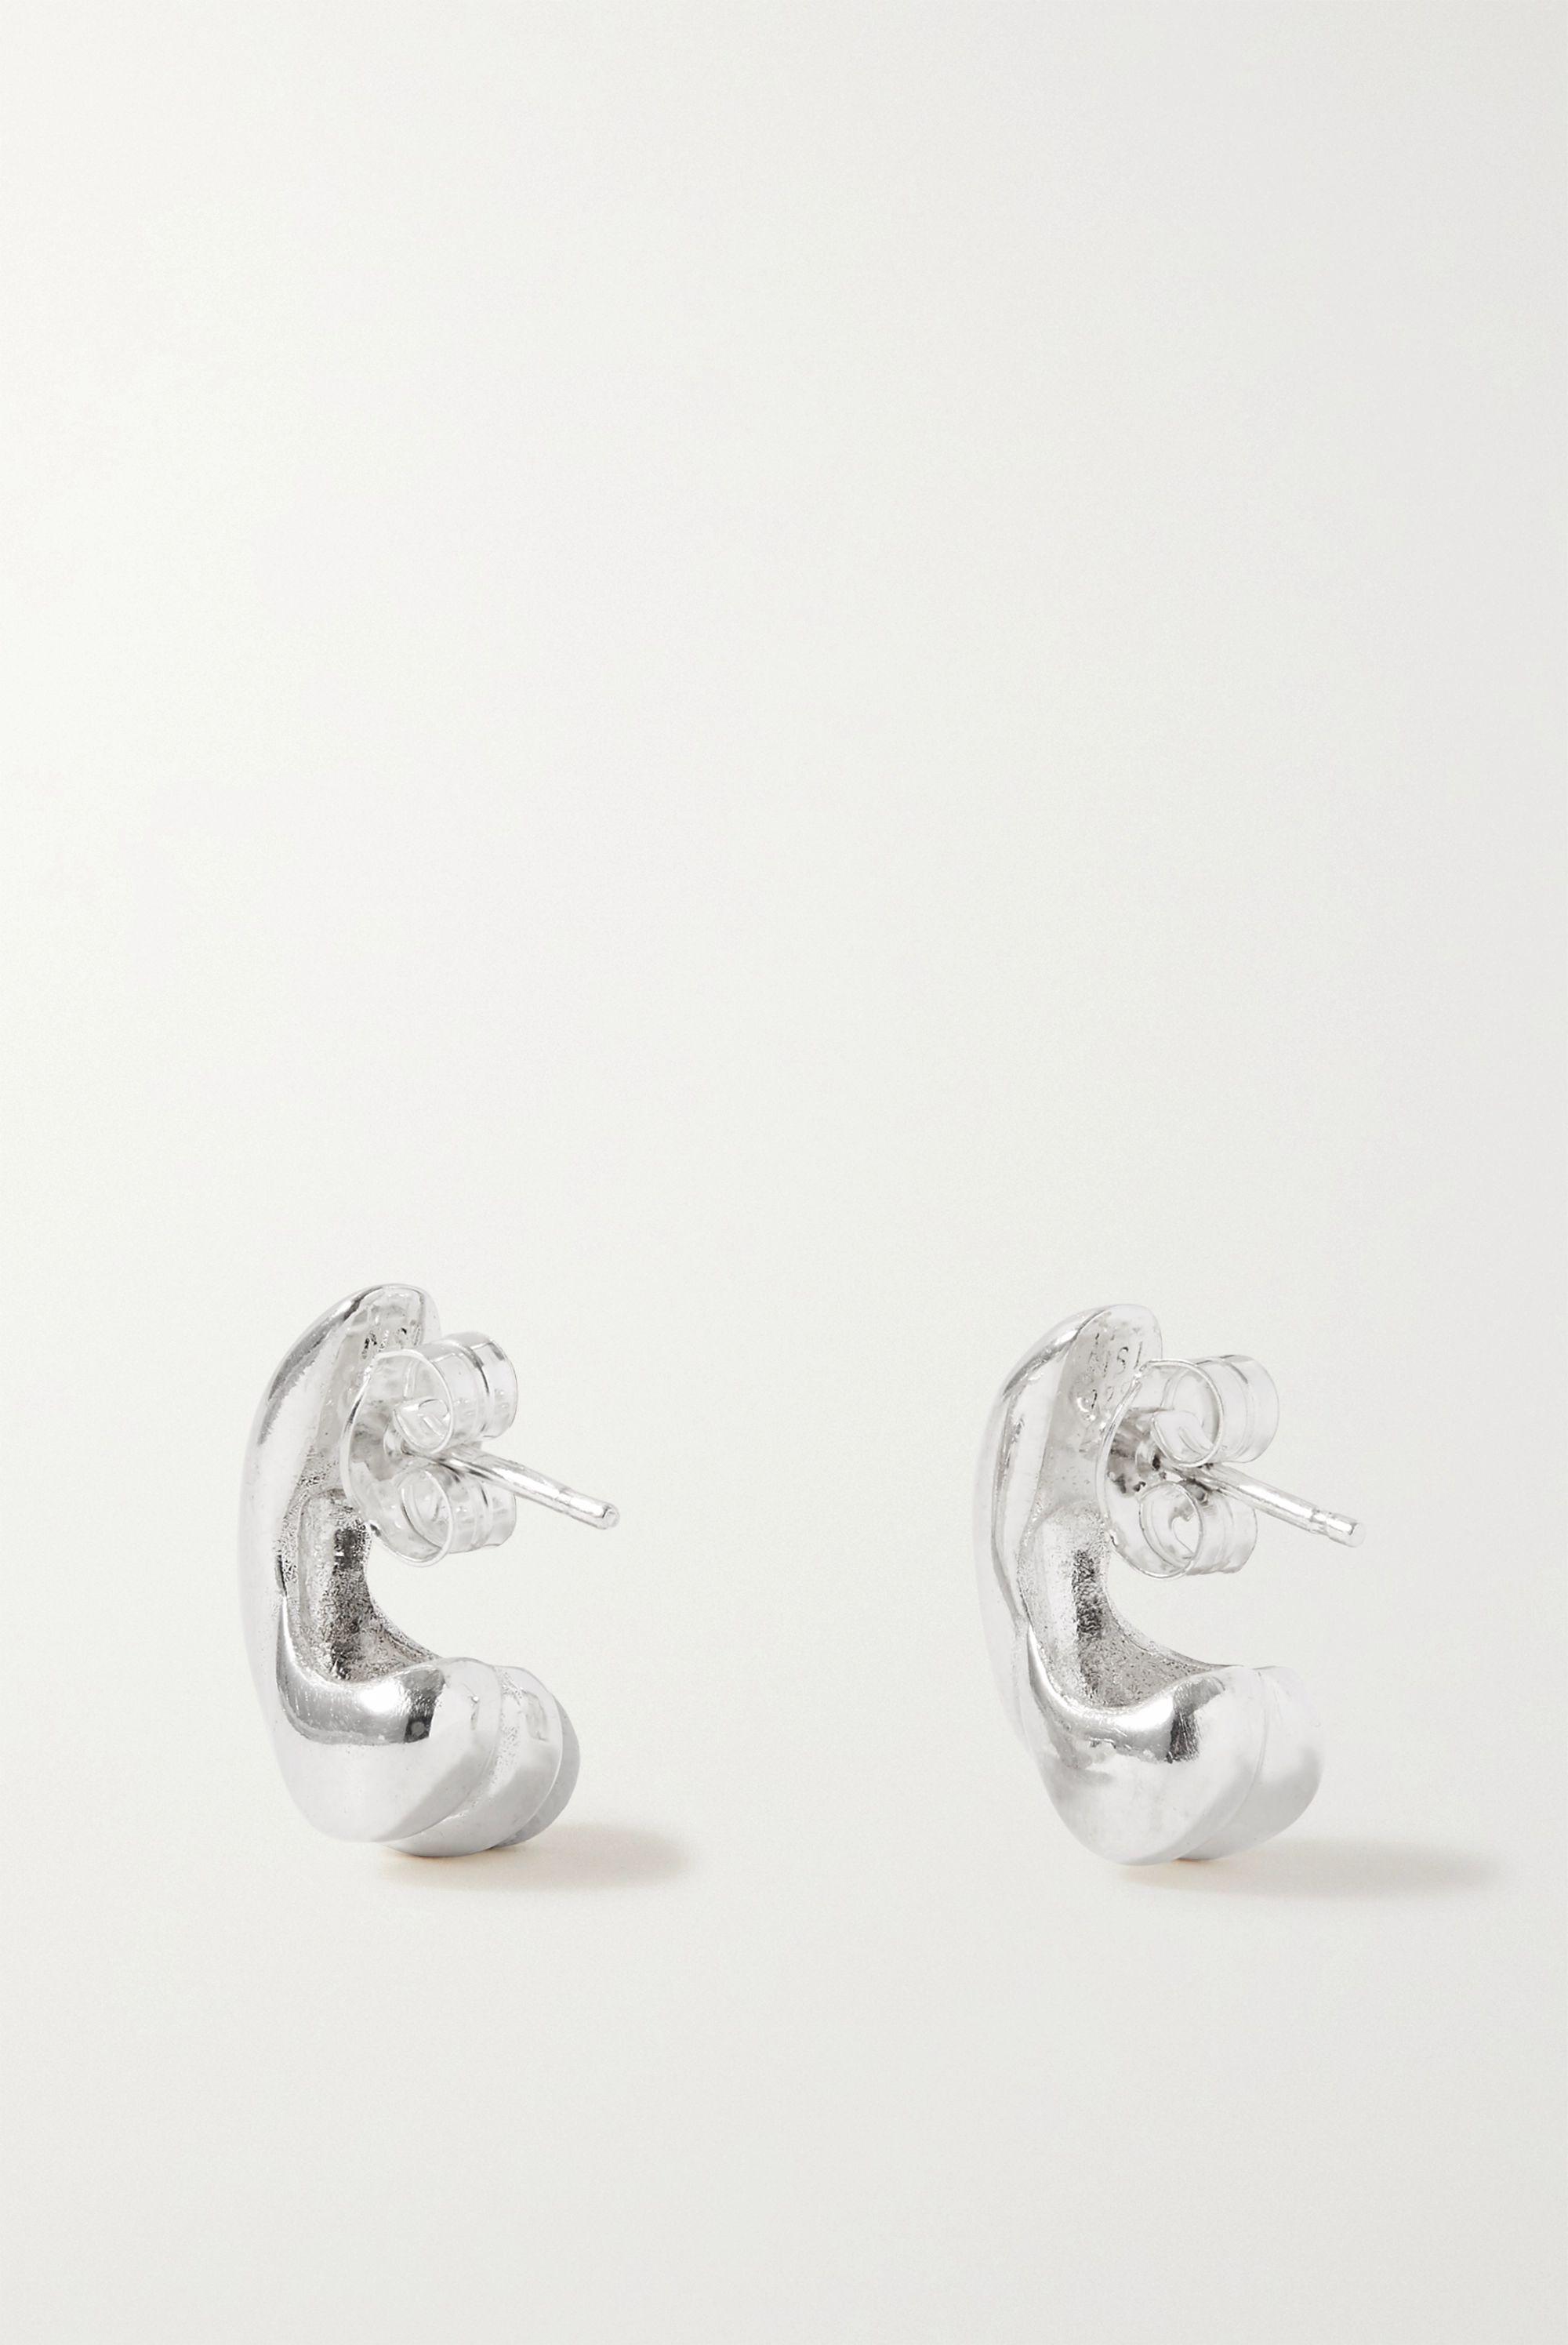 Nathalie Schreckenberg Par silver earrings